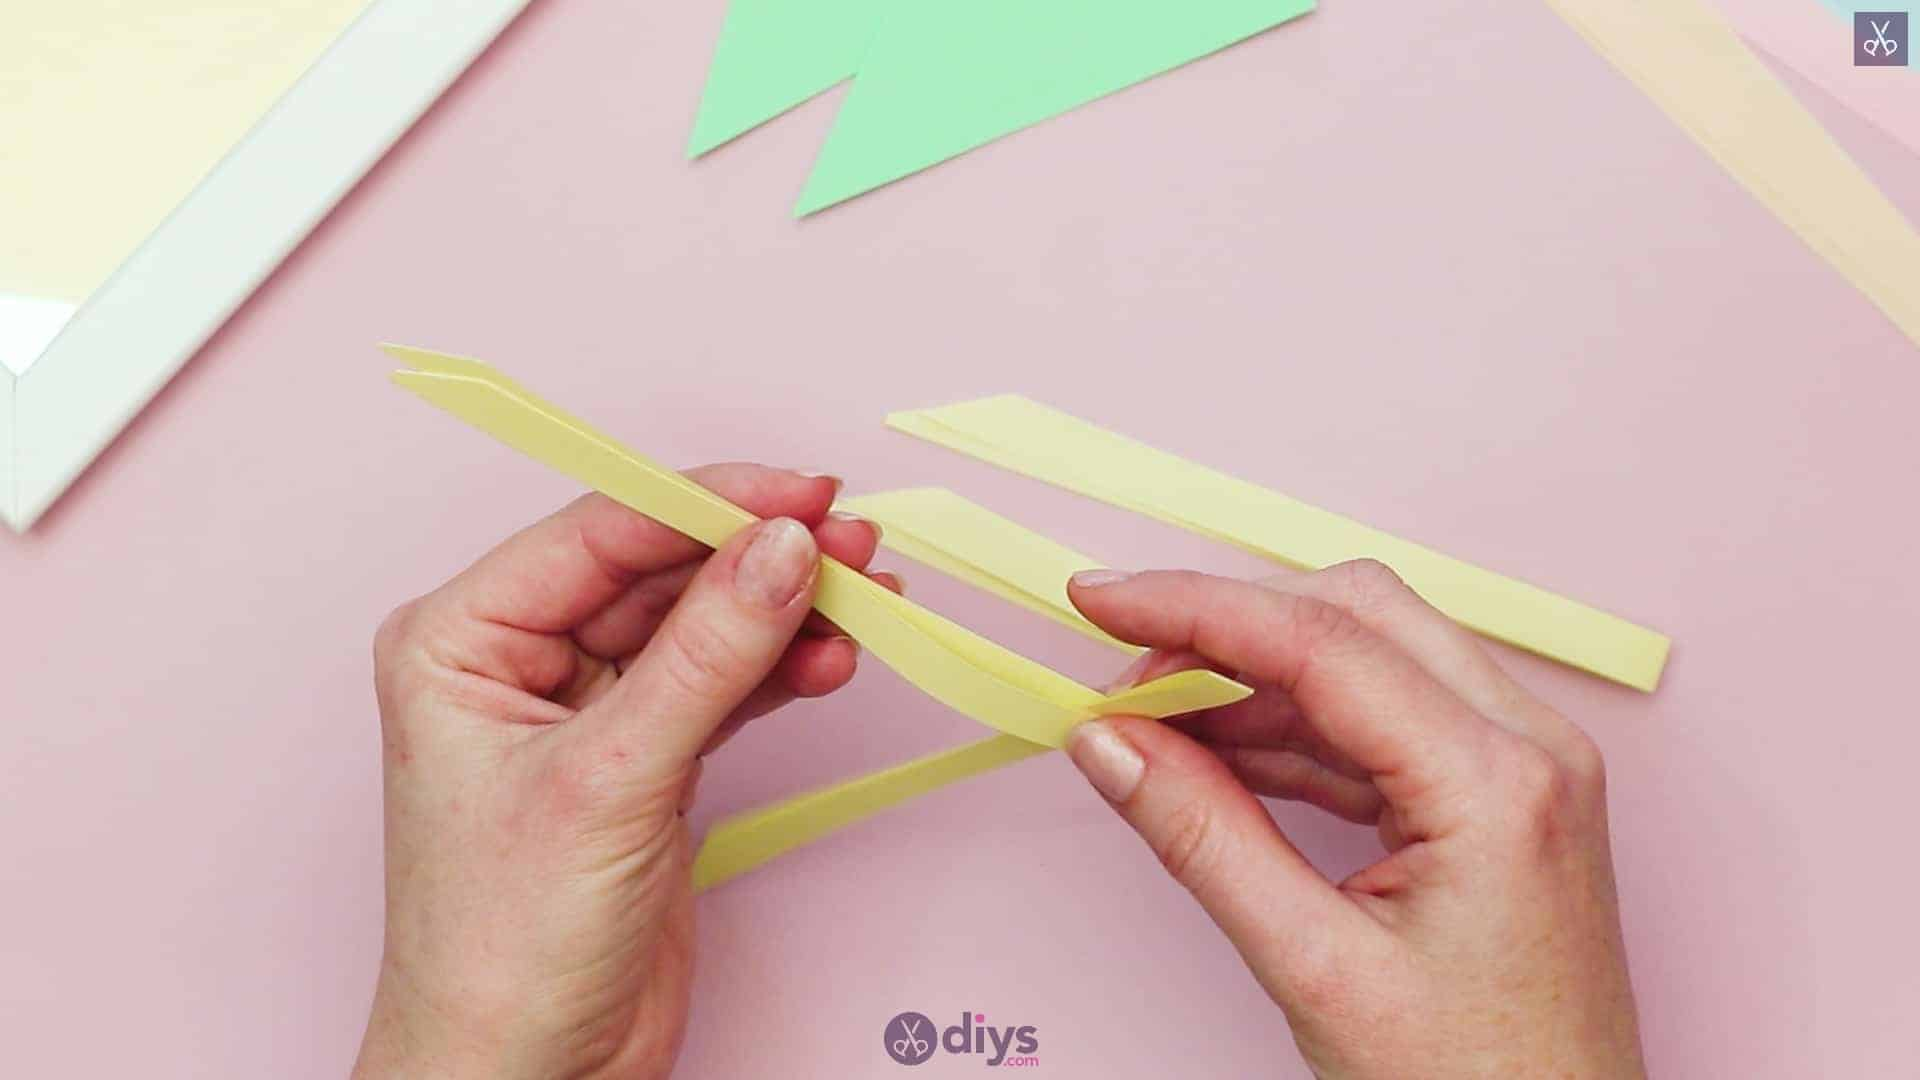 Diy origami flower art step 3a